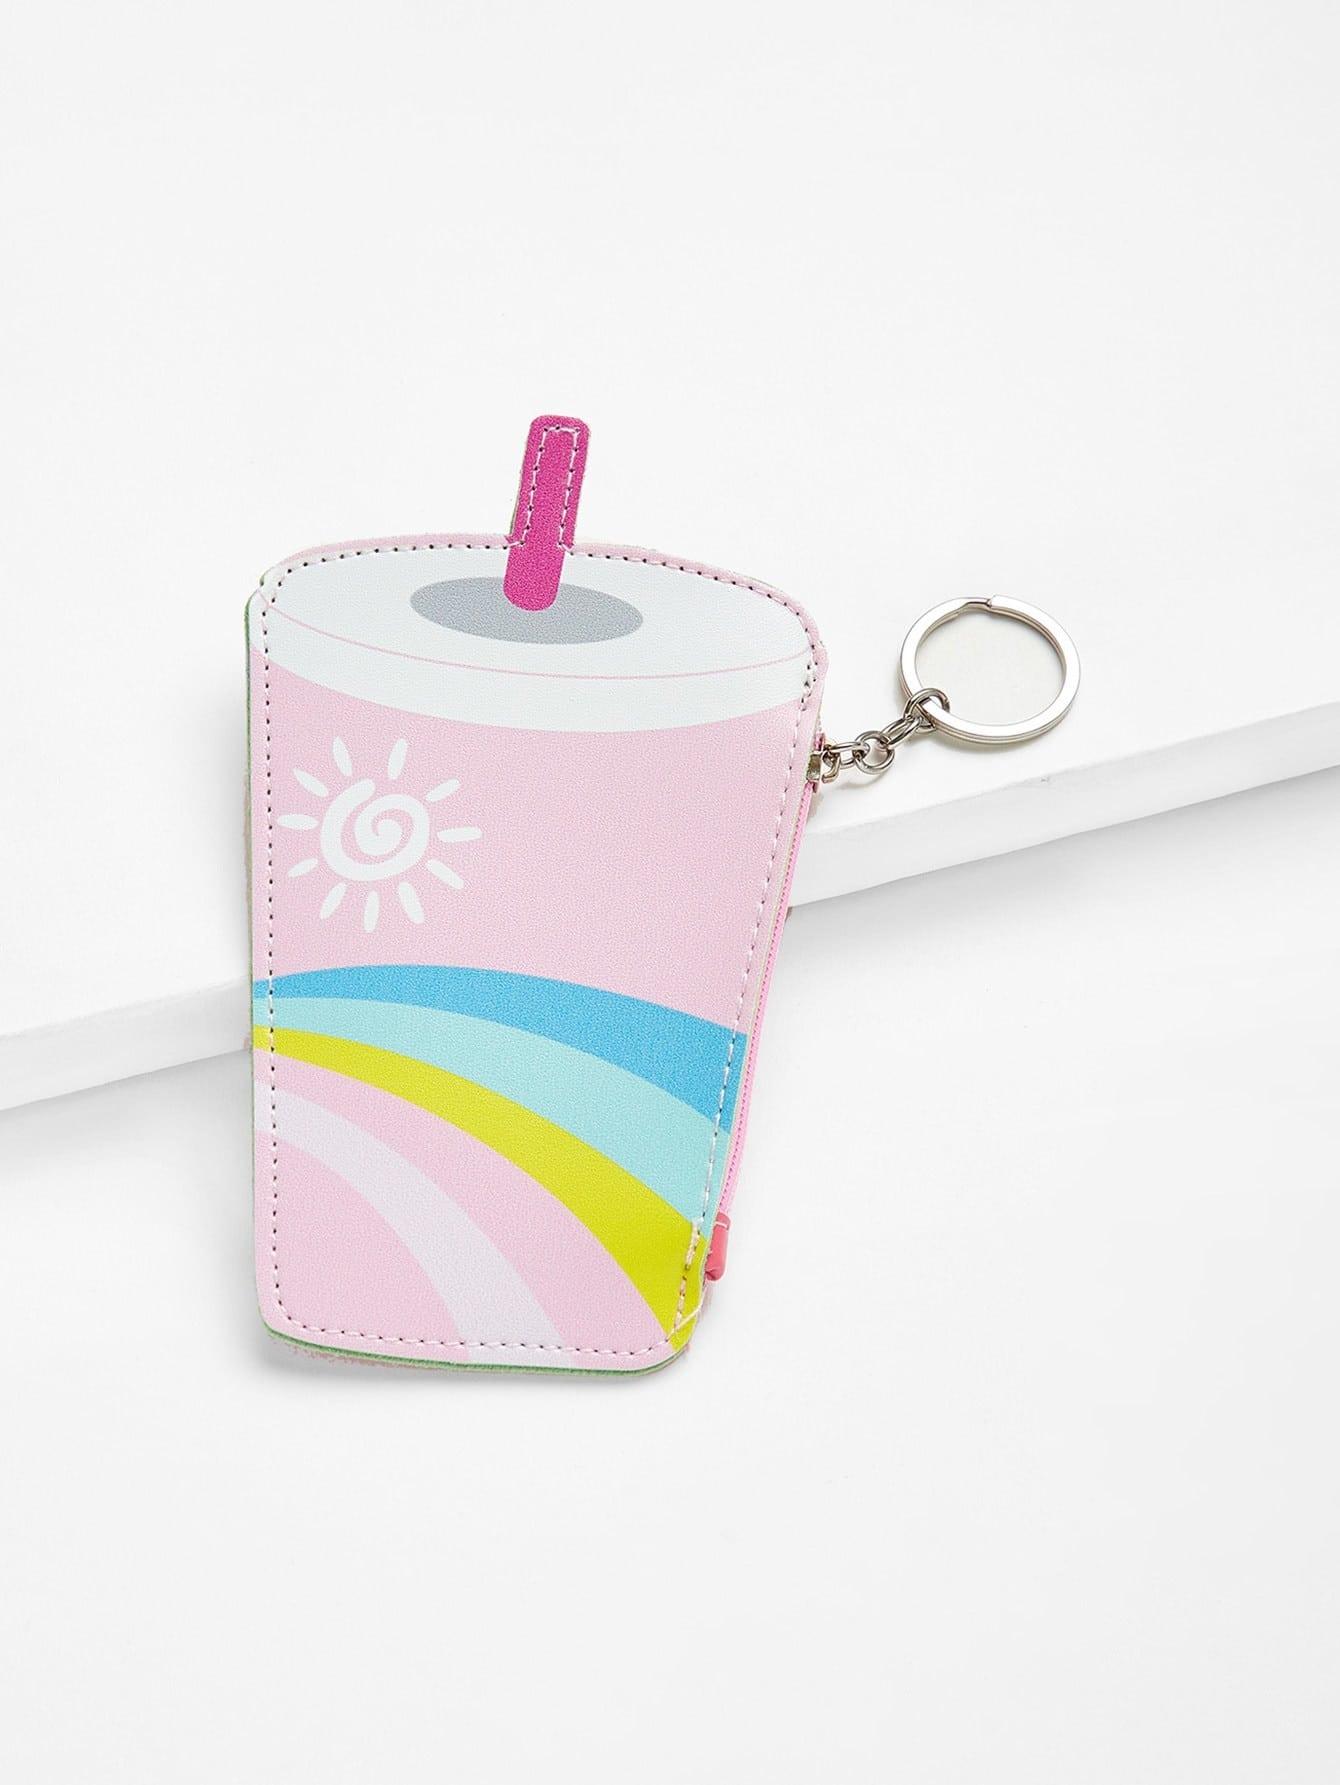 Milk Cup Shaped Wallet